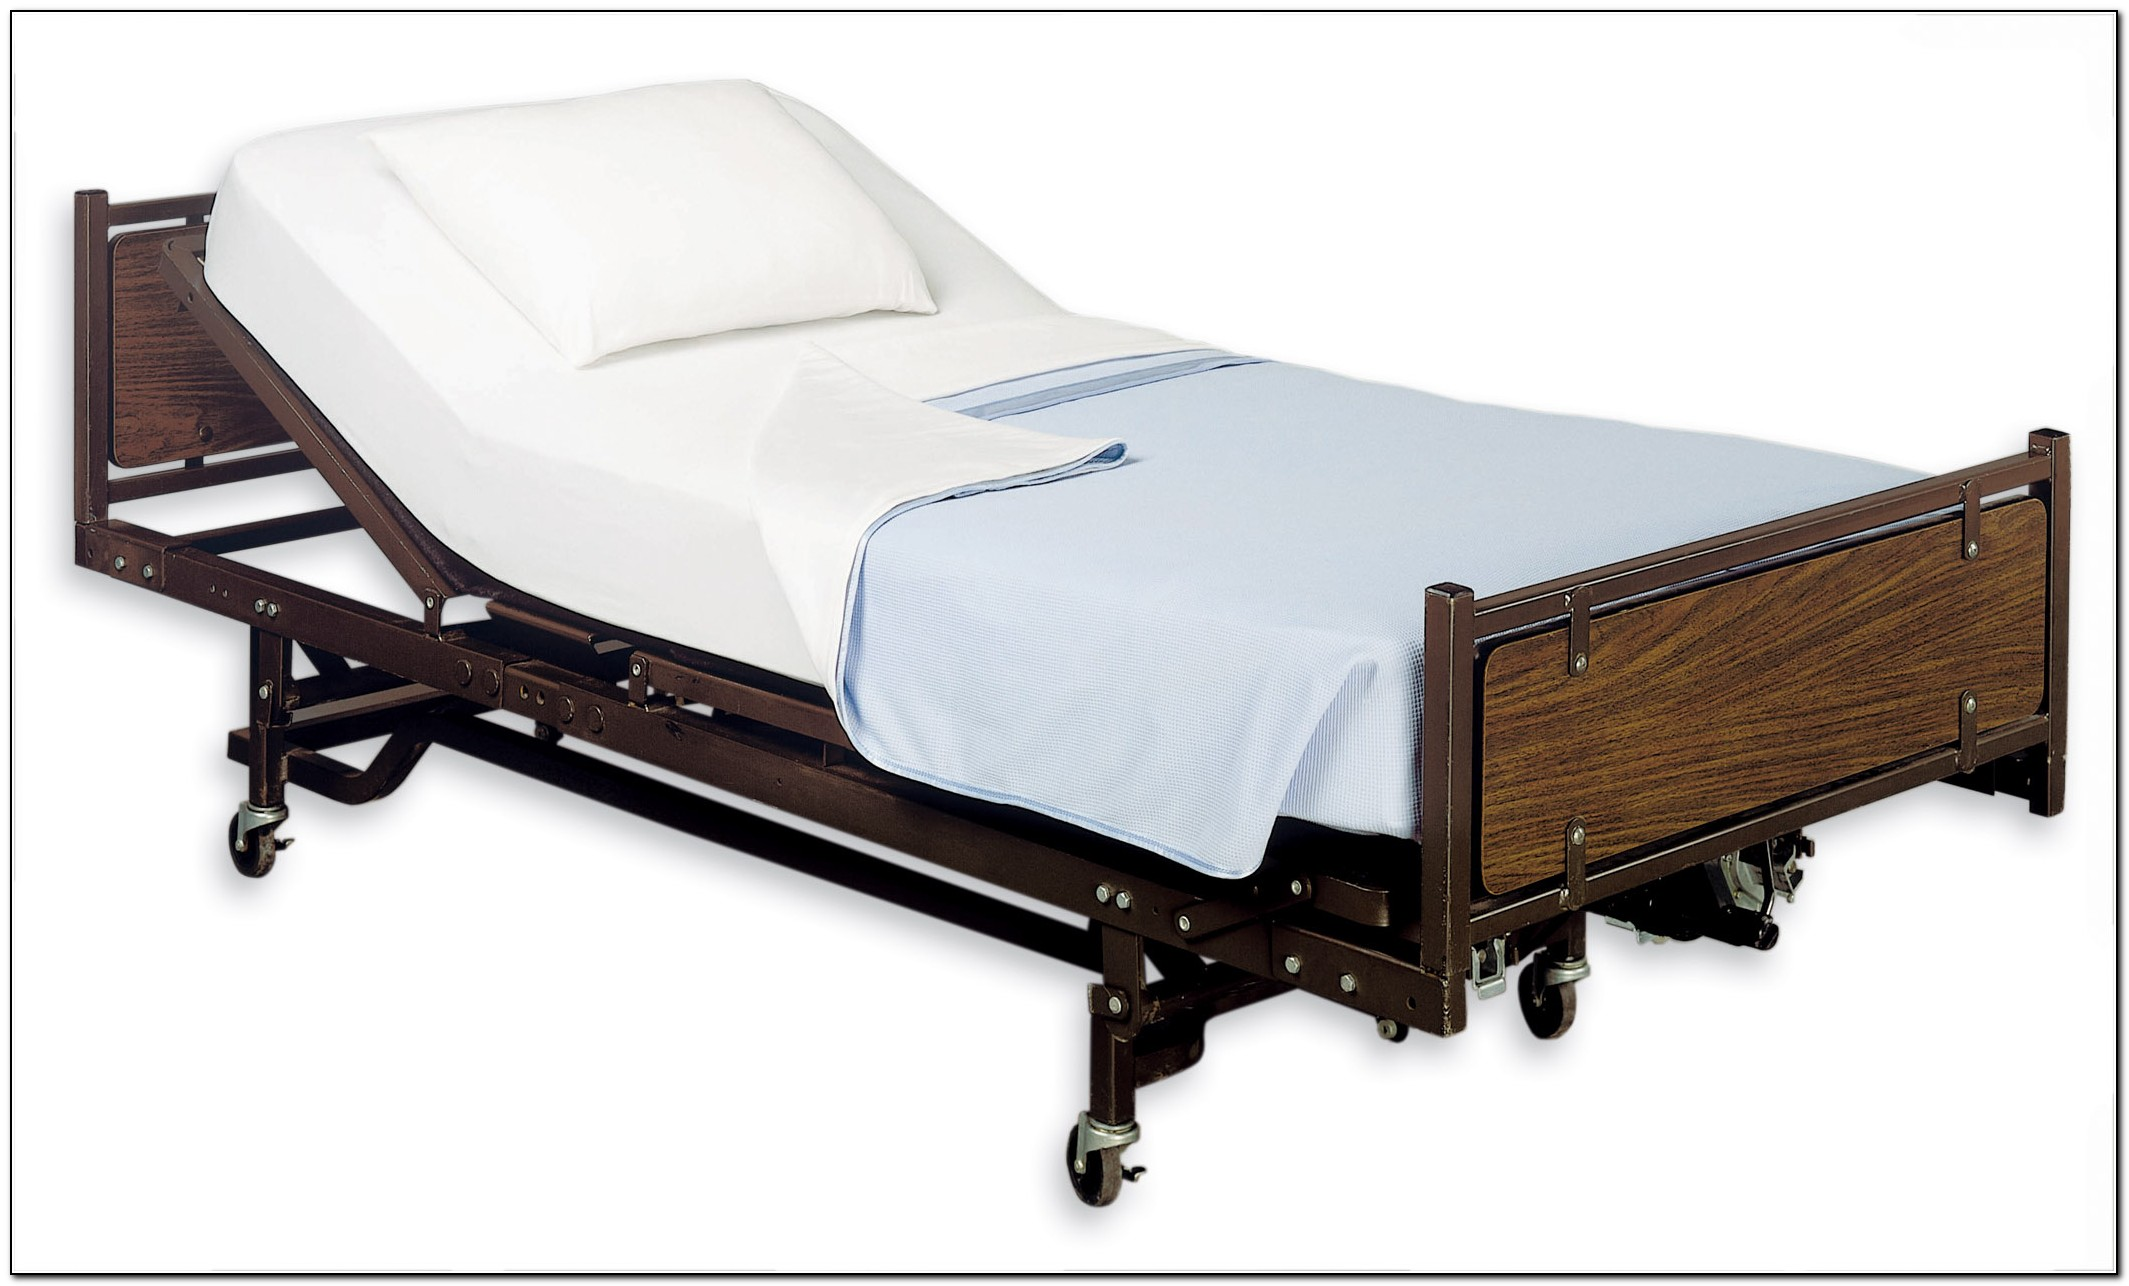 kitchen sink air gap home depot light fixtures hospital bed rental houston download page – design ...